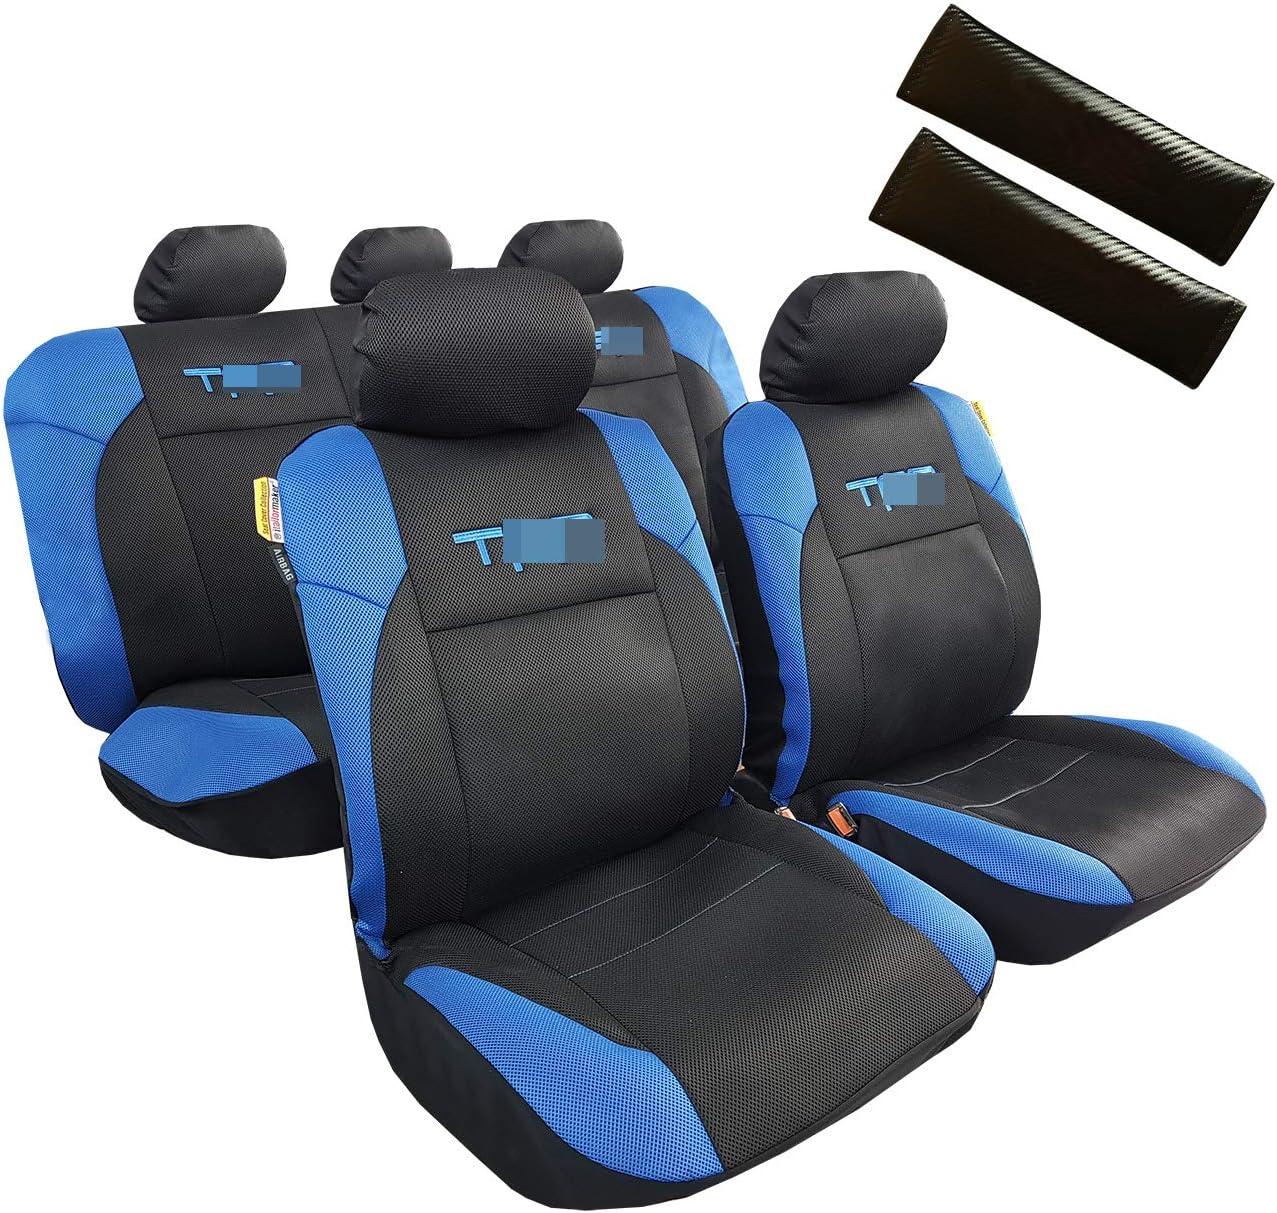 I tailor Maker 3D Spacer Mesh Seat Cover